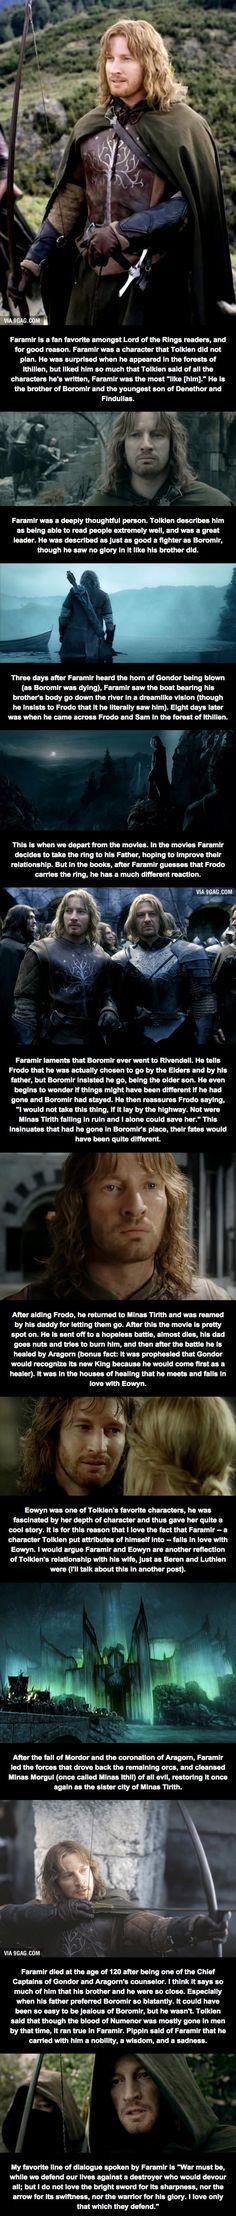 Relatively Unknown LoTR Fact (Part 5) - Faramir Captain of Gondor